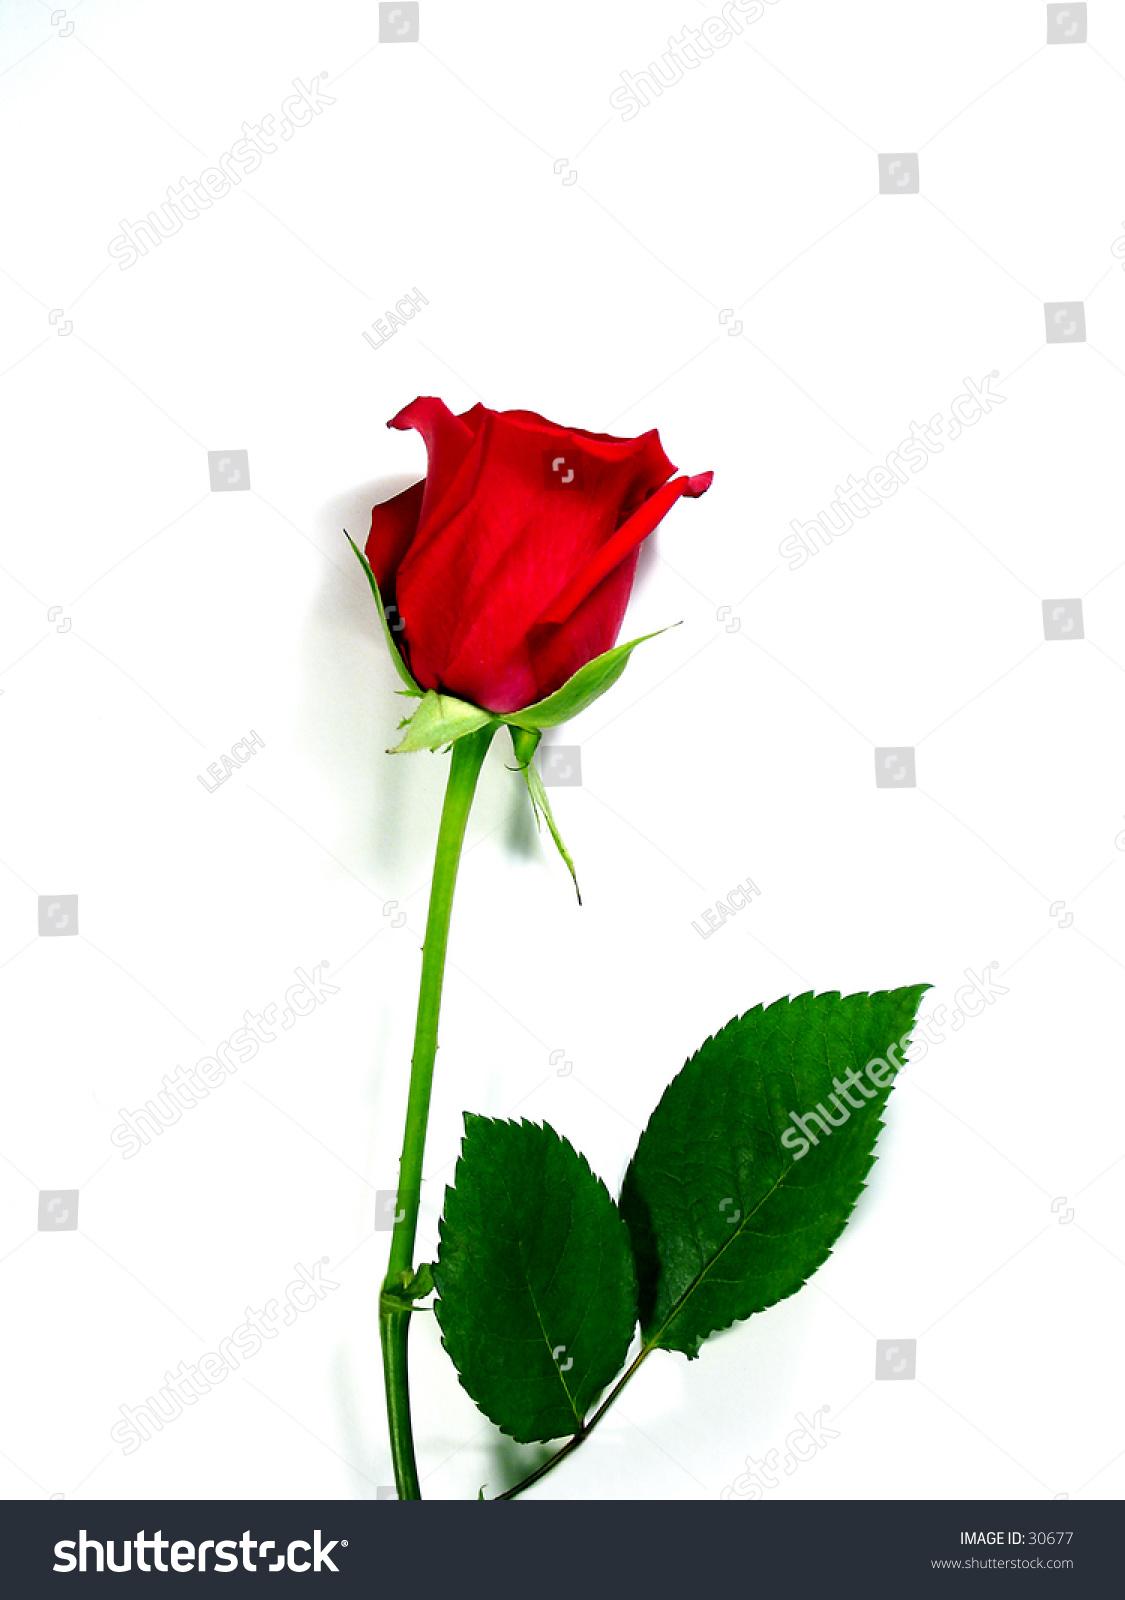 Single red rose on white symbol stock photo 30677 shutterstock single red rose on white symbol of love and romance bright white background buycottarizona